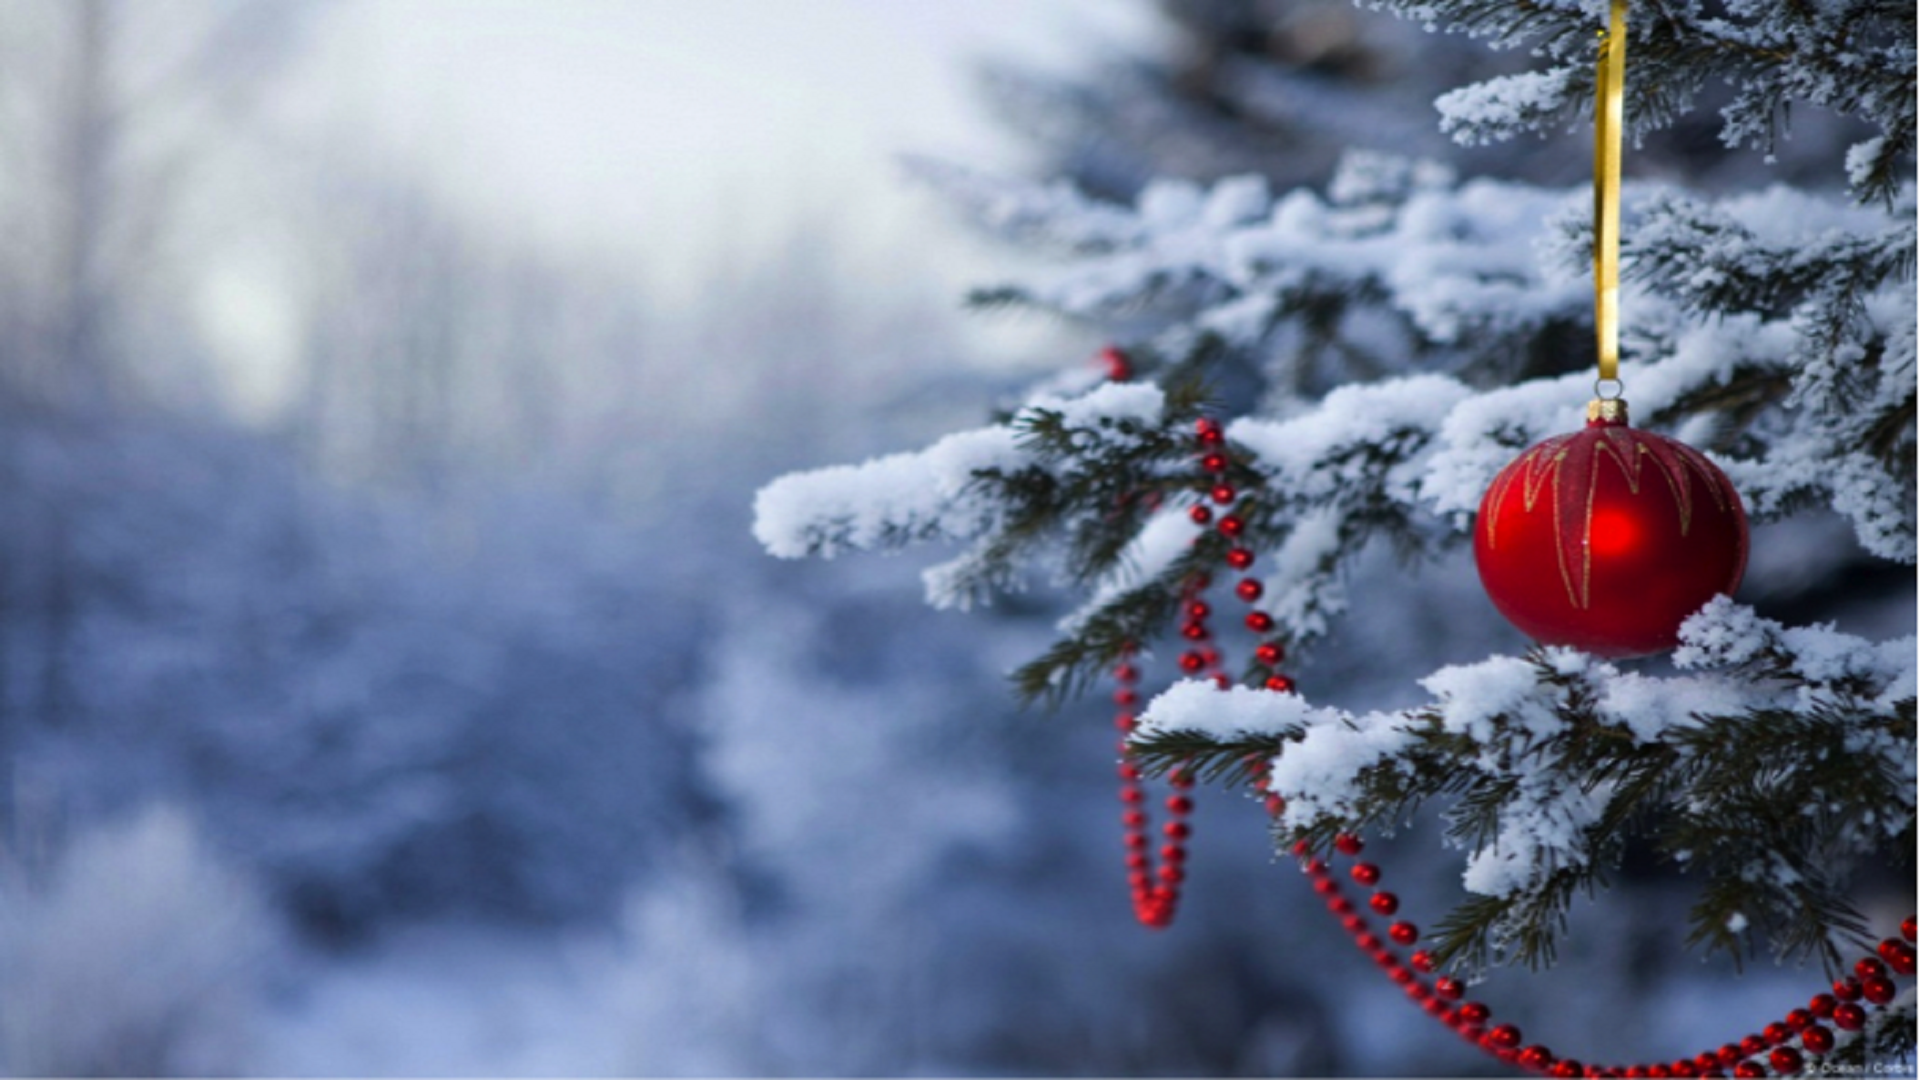 Festive christmas tree wallpaper free hd hd wallpaper for Home 2015 wallpaper hd